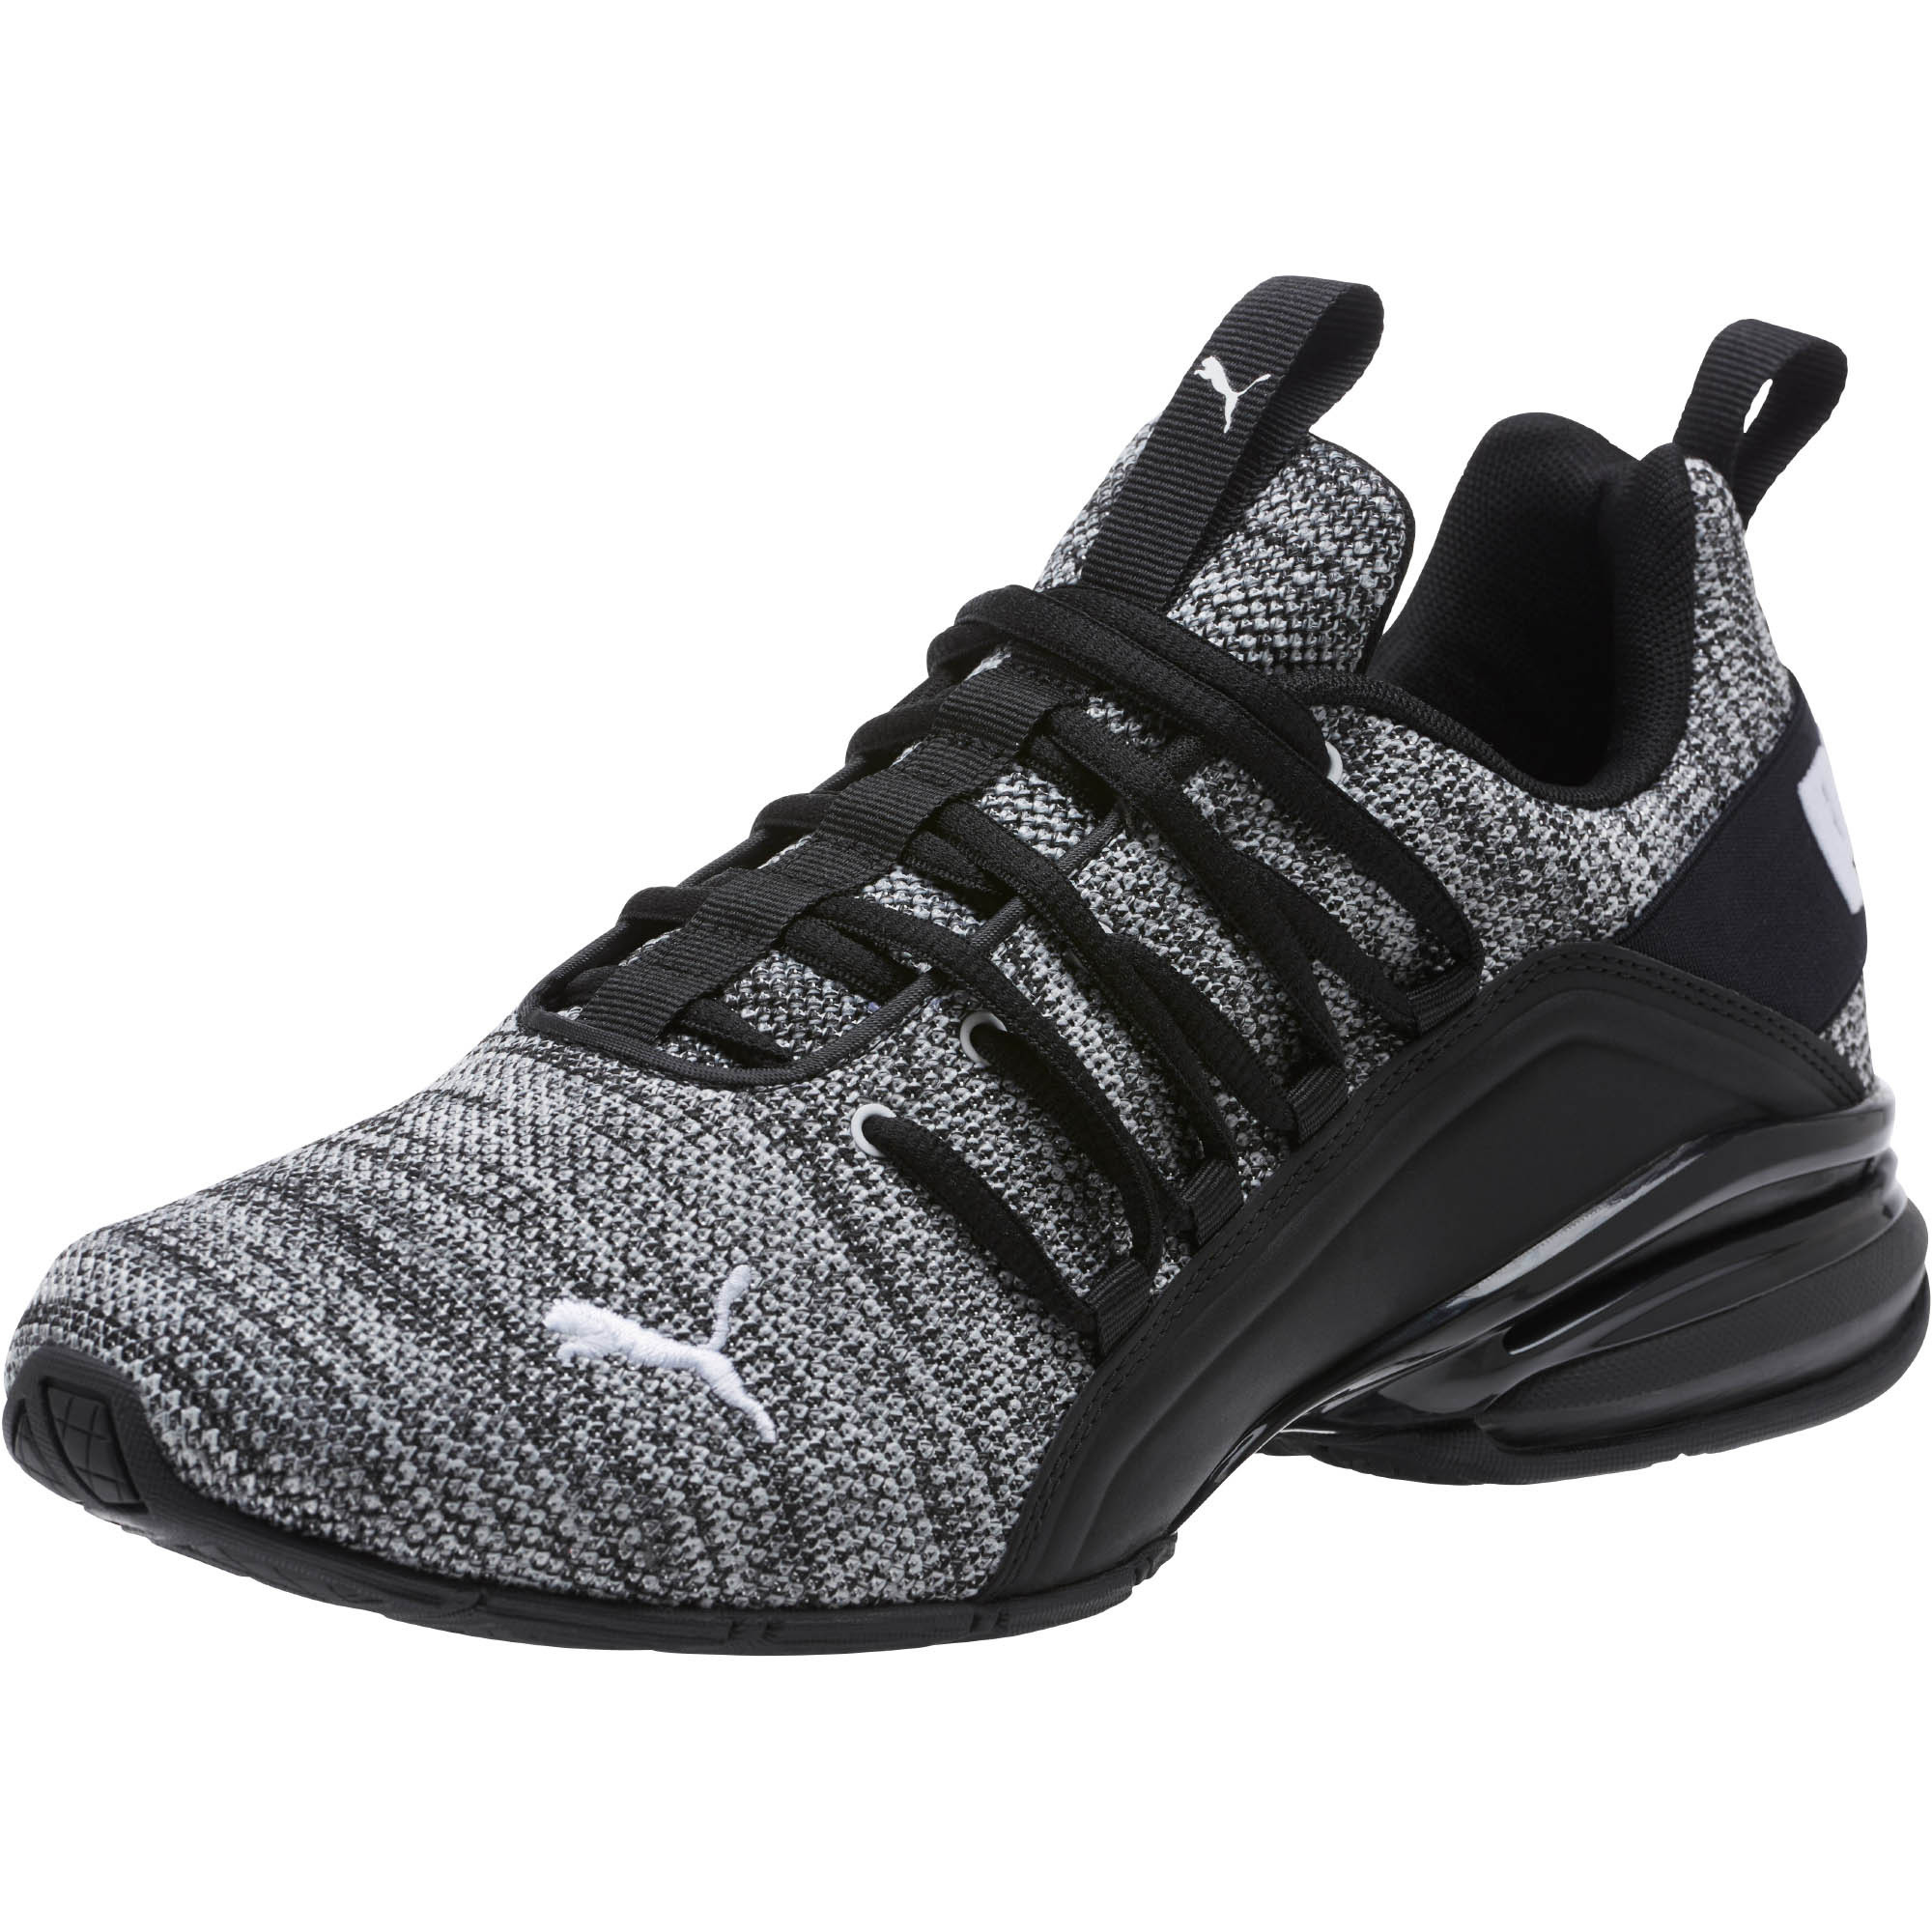 PUMA-Axelion-Men-039-s-Training-Shoes-Men-Shoe-Running thumbnail 20